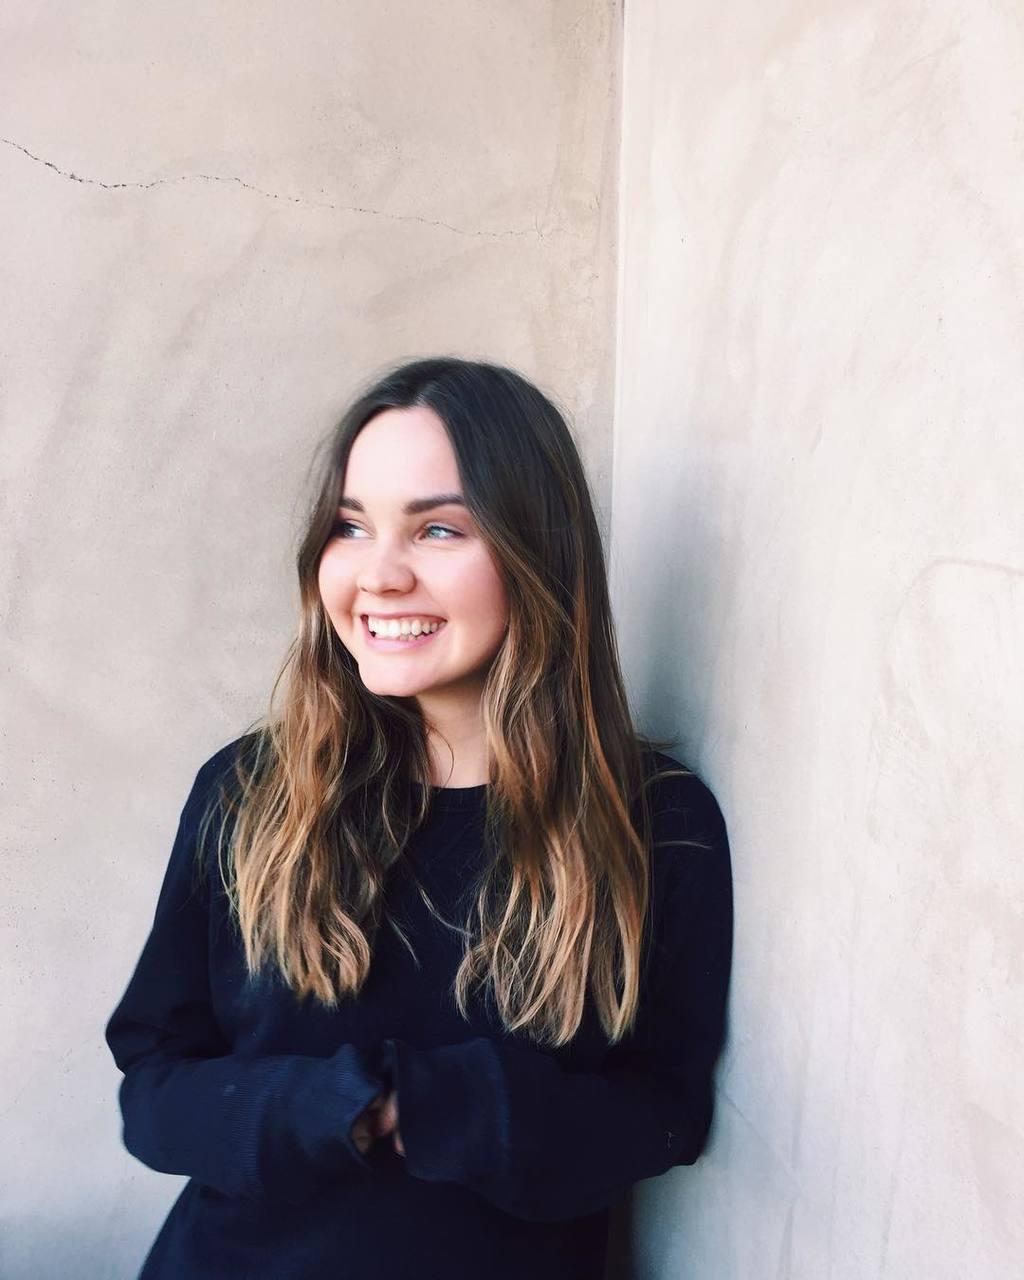 Liana Liberato Wiki, Bio, Family, Career, Net Worth, Boyfriend, Social Life